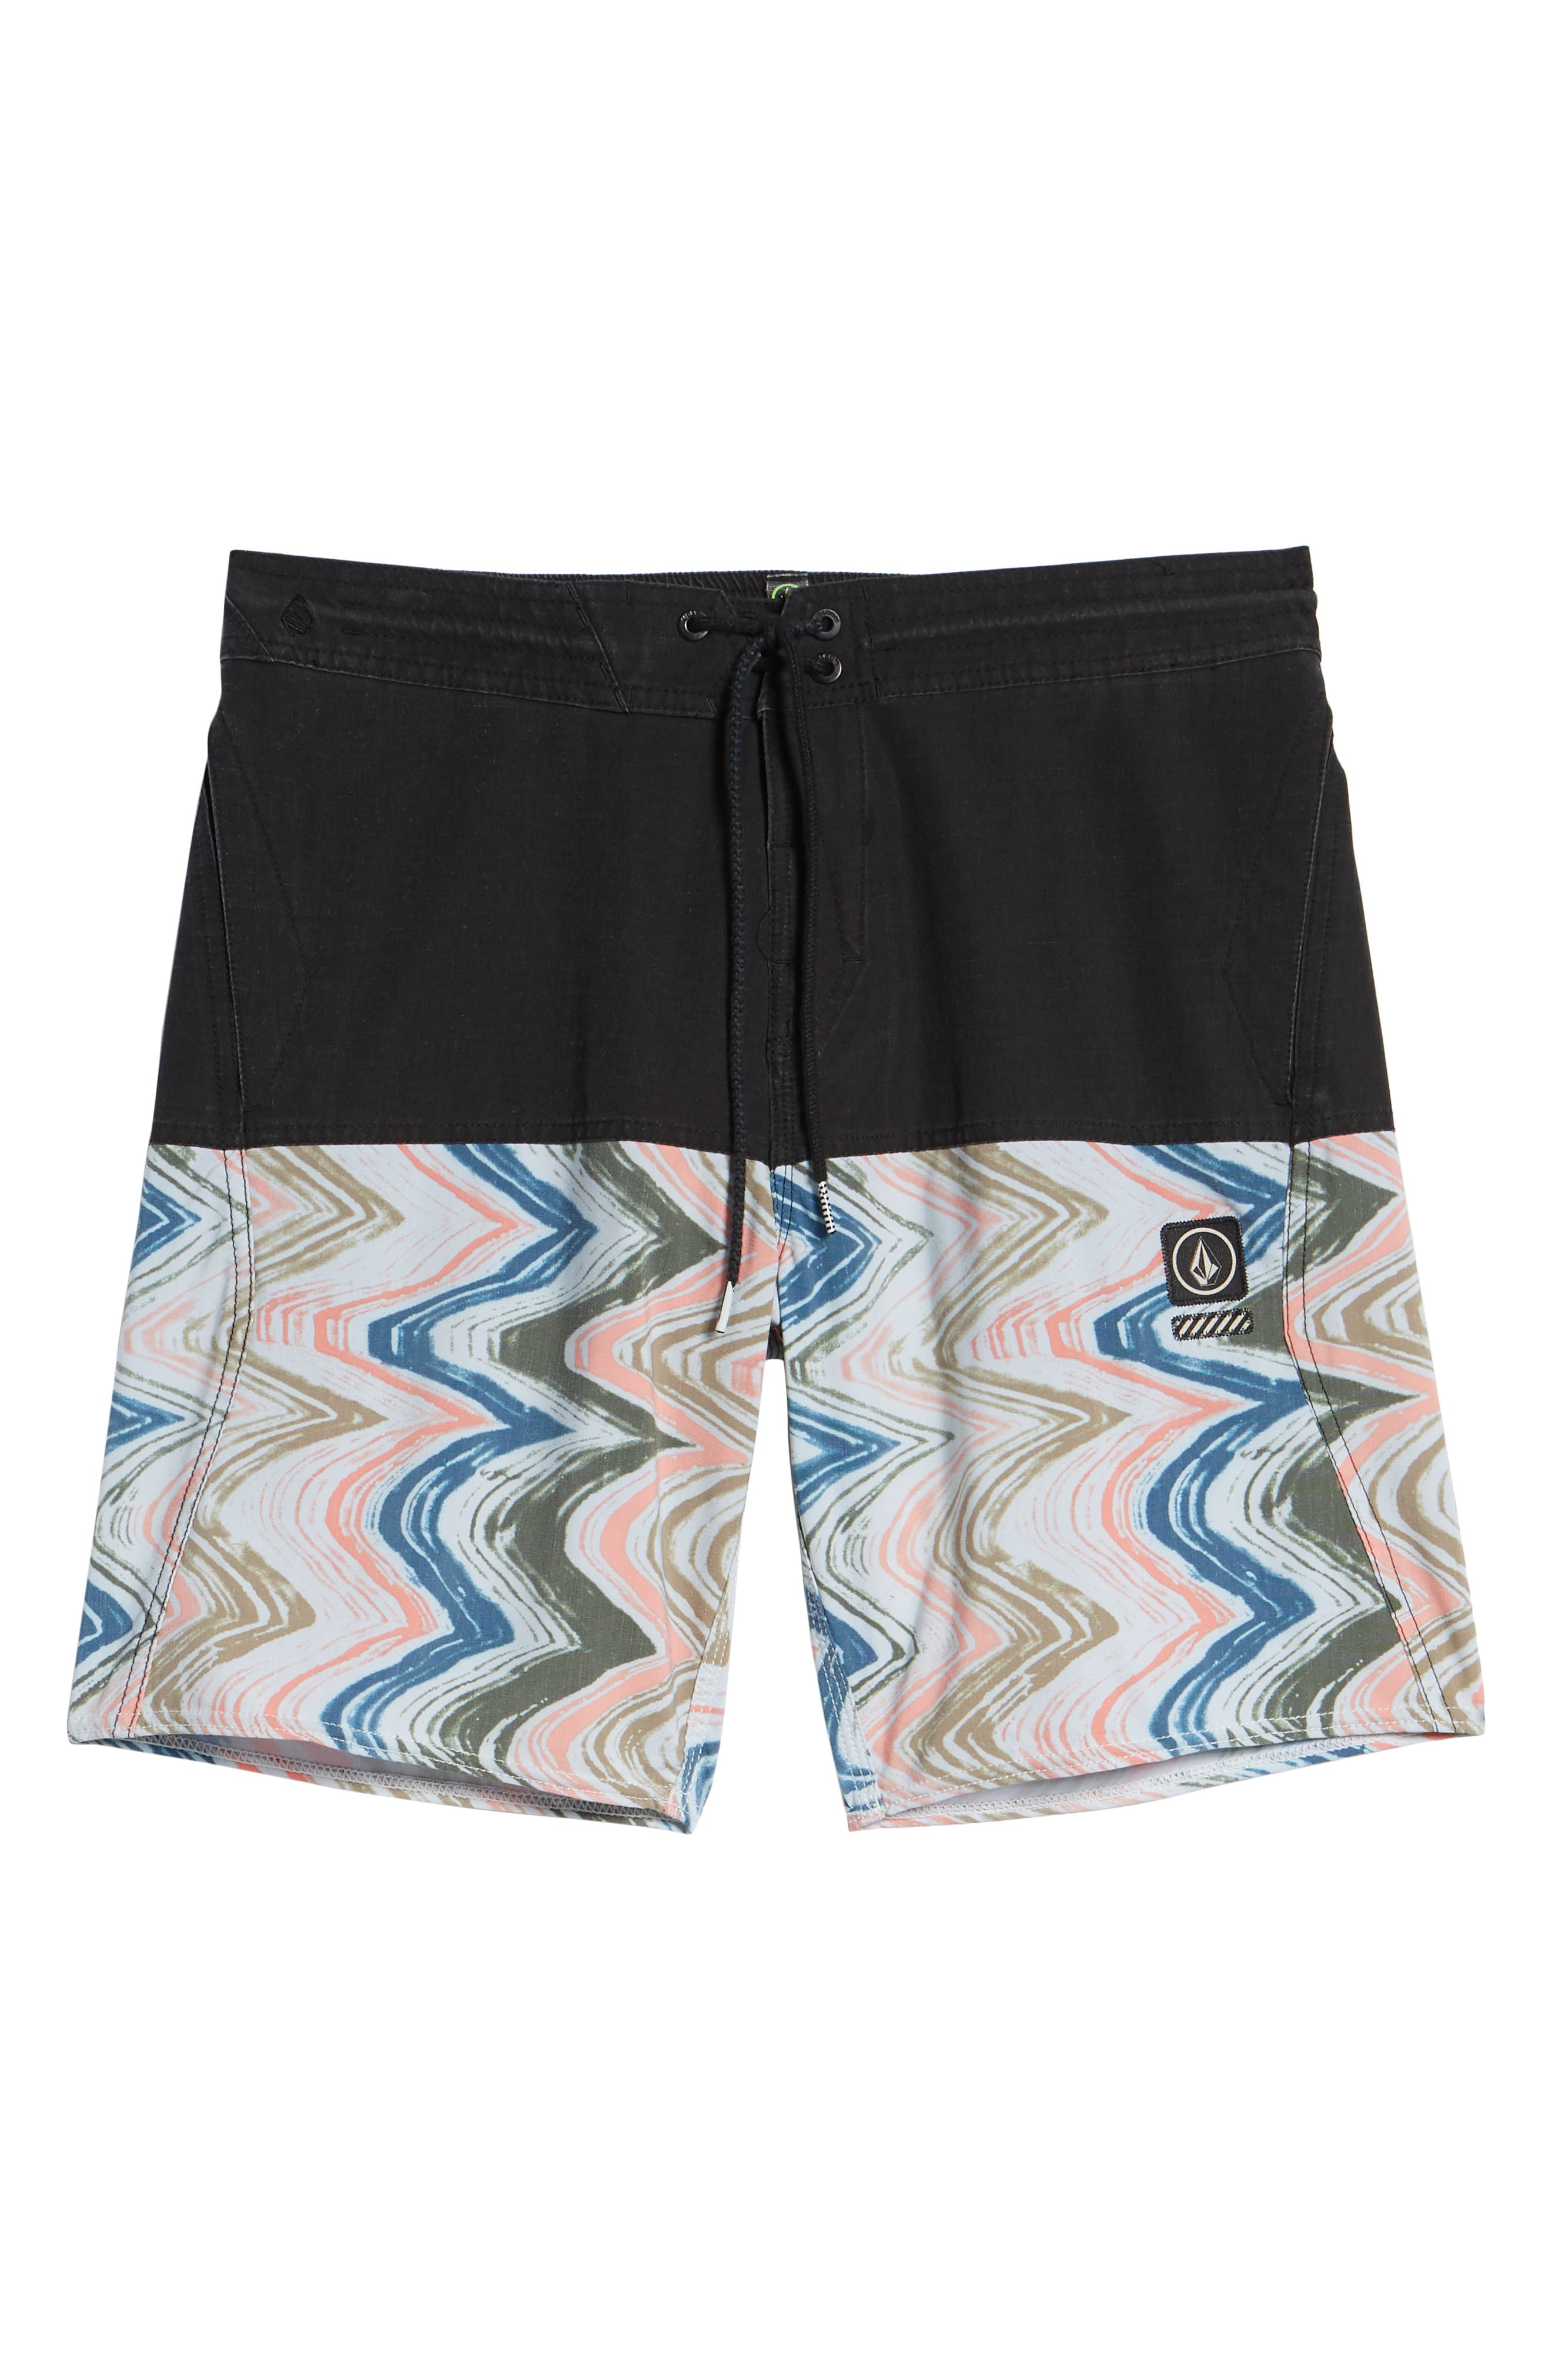 Vibes Half Stoney Board Shorts,                             Alternate thumbnail 18, color,